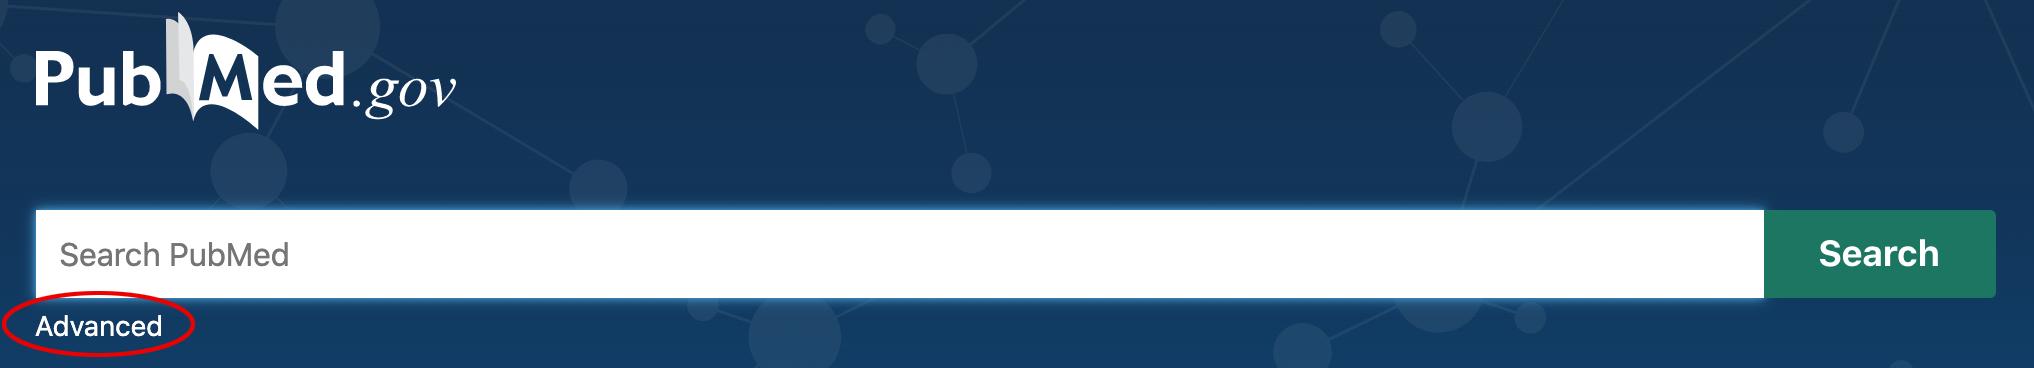 Advanced link under search bar